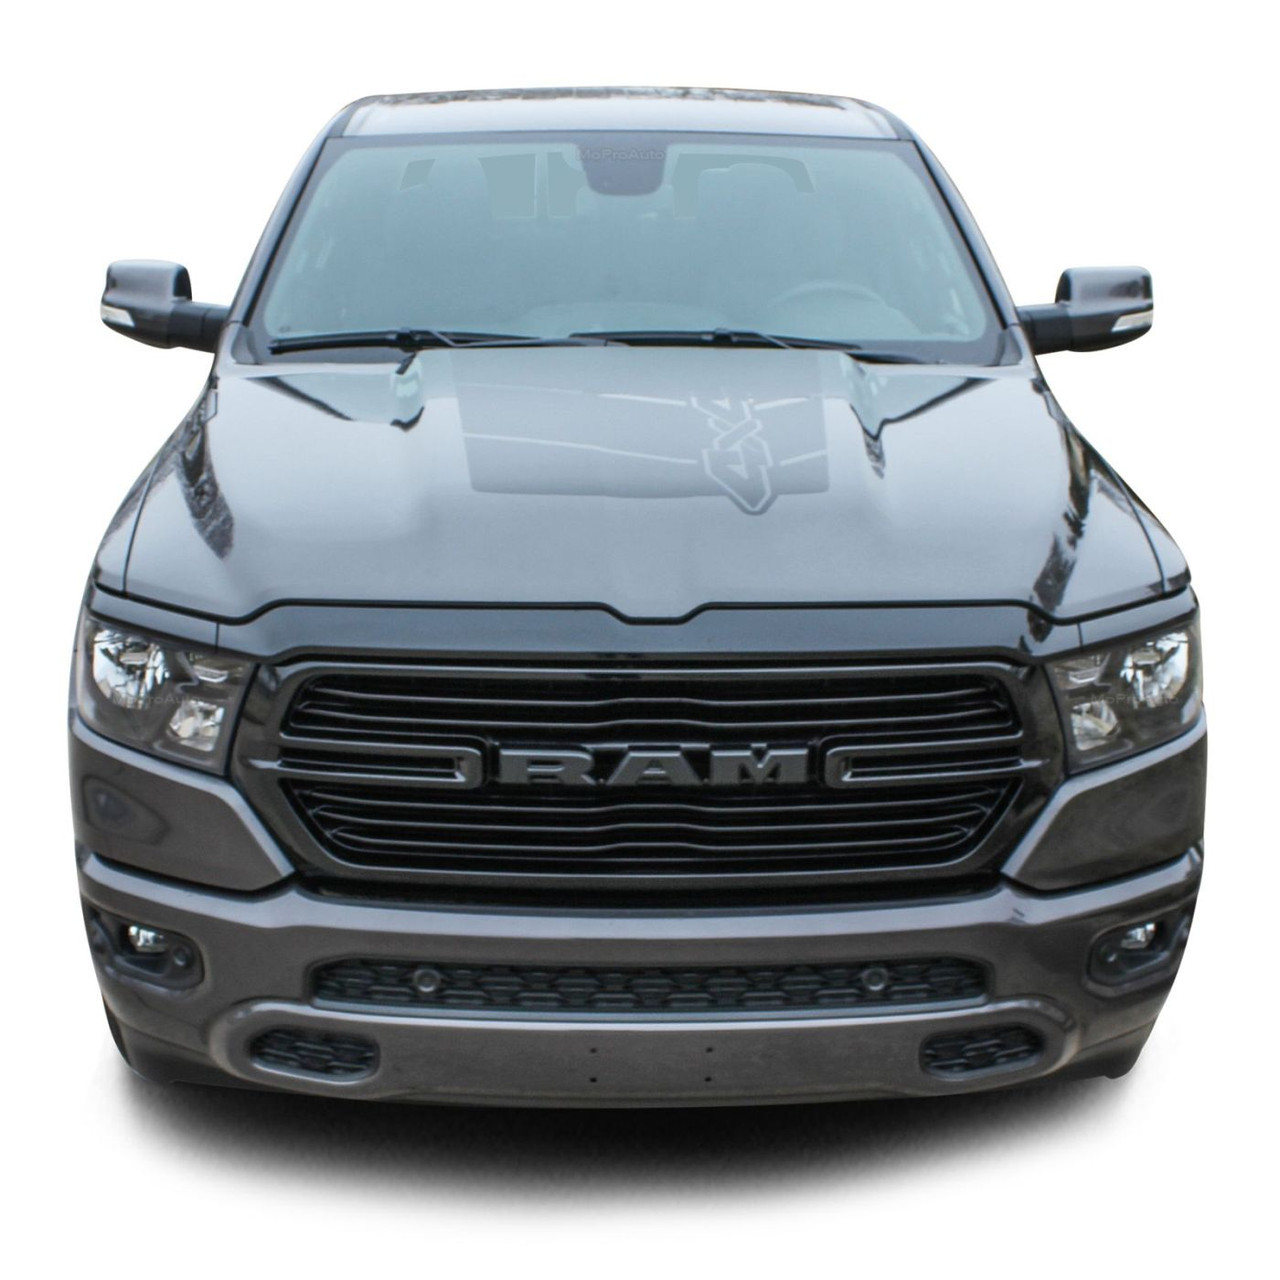 Revolution 1500 Hood 2019 2020 Dodge Ram 1500 Hood Decals Vinyl Graphic Stripe Kit Moproauto Professional Vinyl Graphics And Striping